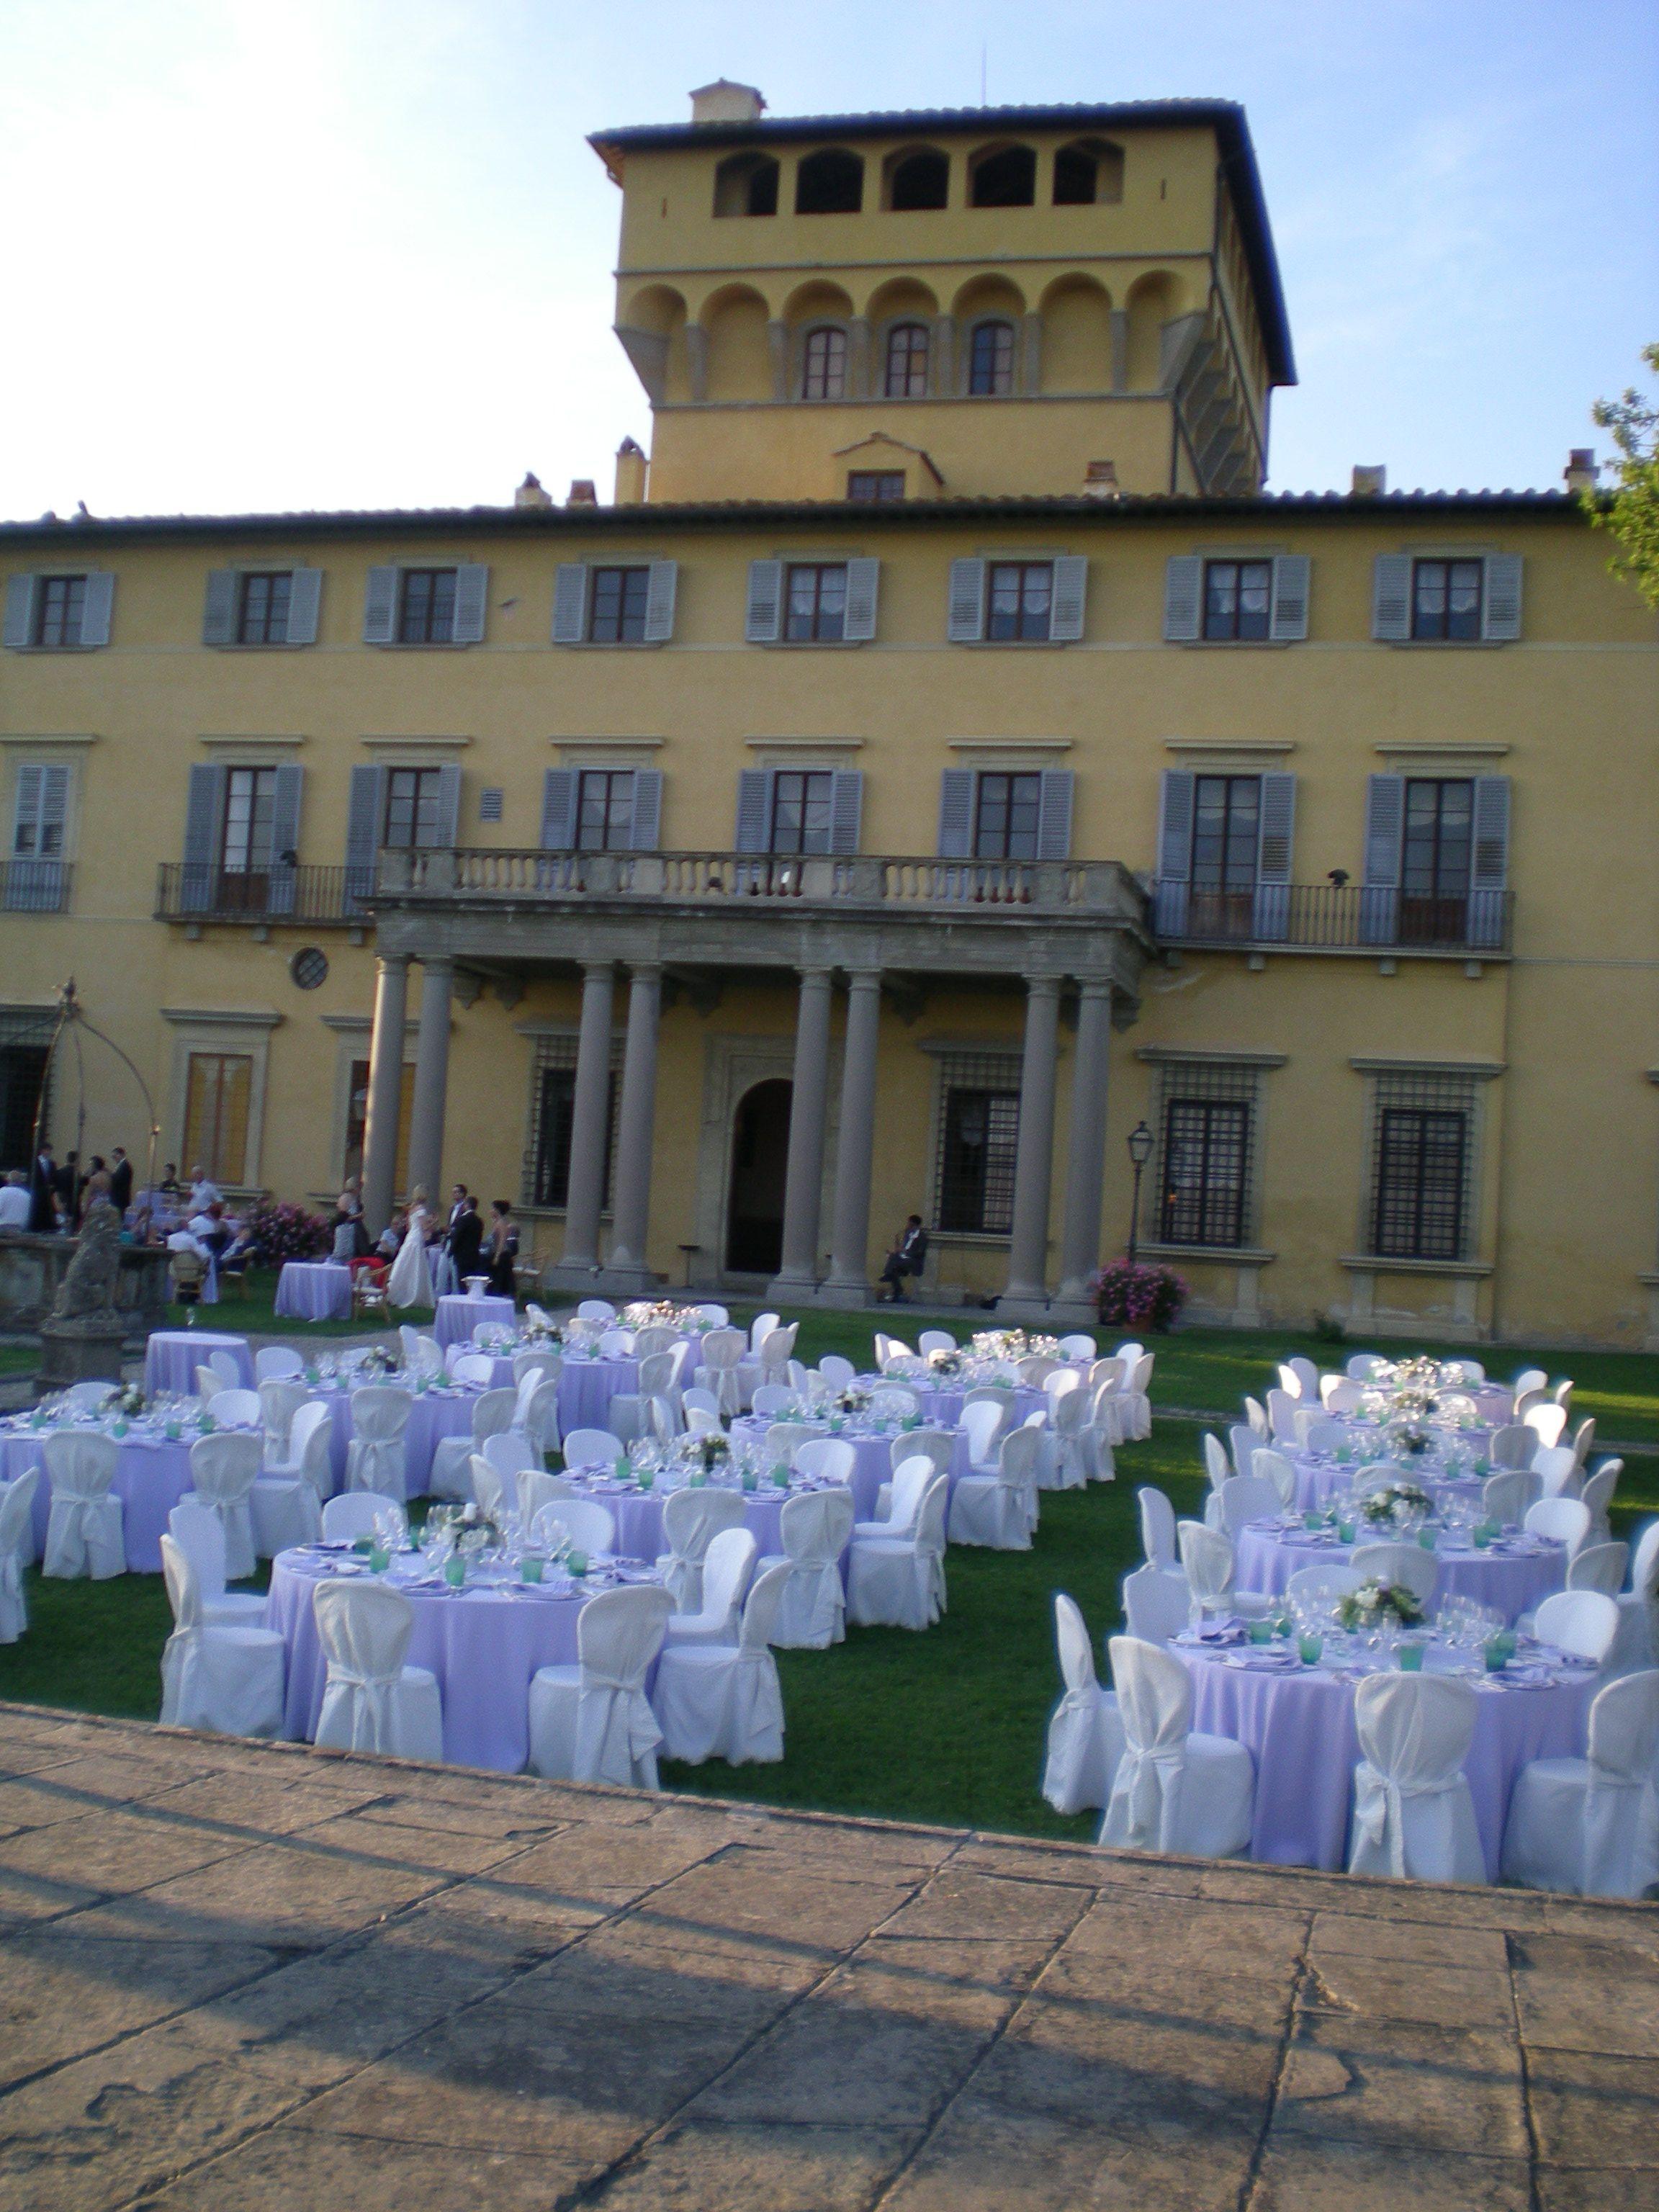 angela bartolini wedding in tuscany Dimora storica con